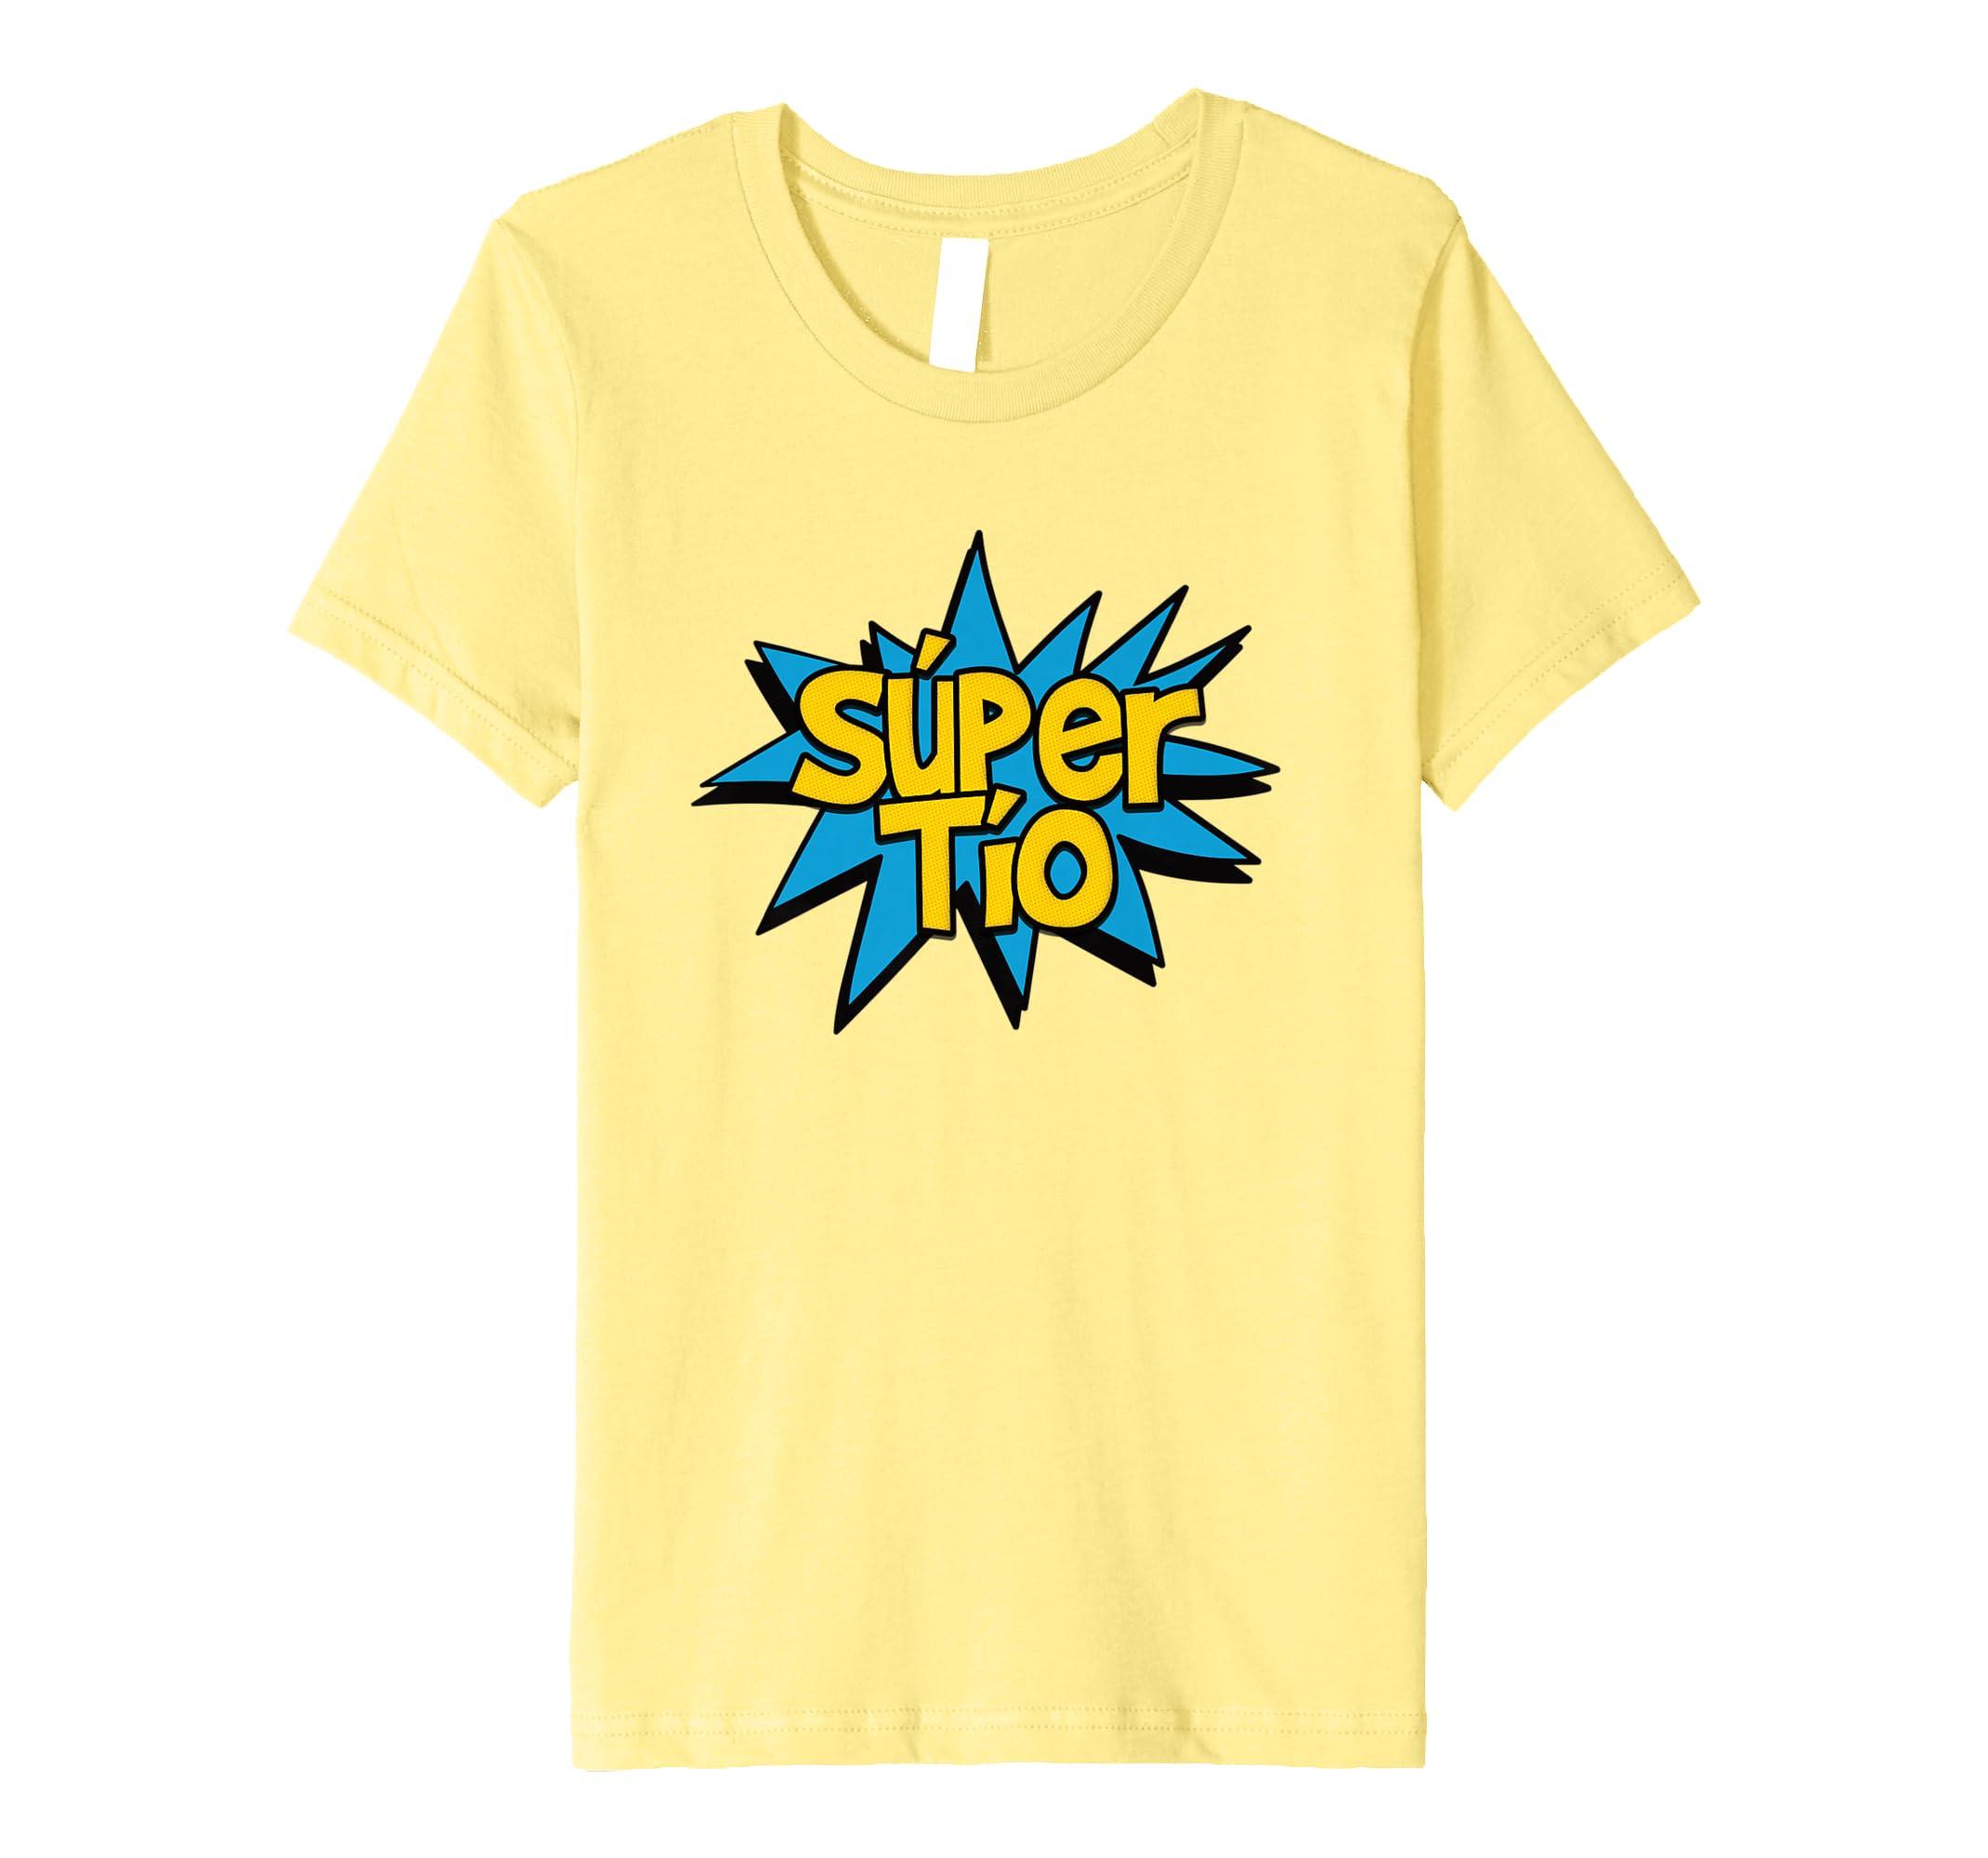 Amazon.com: Super Tio - Spanish Uncle Comic Hero Graphic T-shirt Tee: Clothing